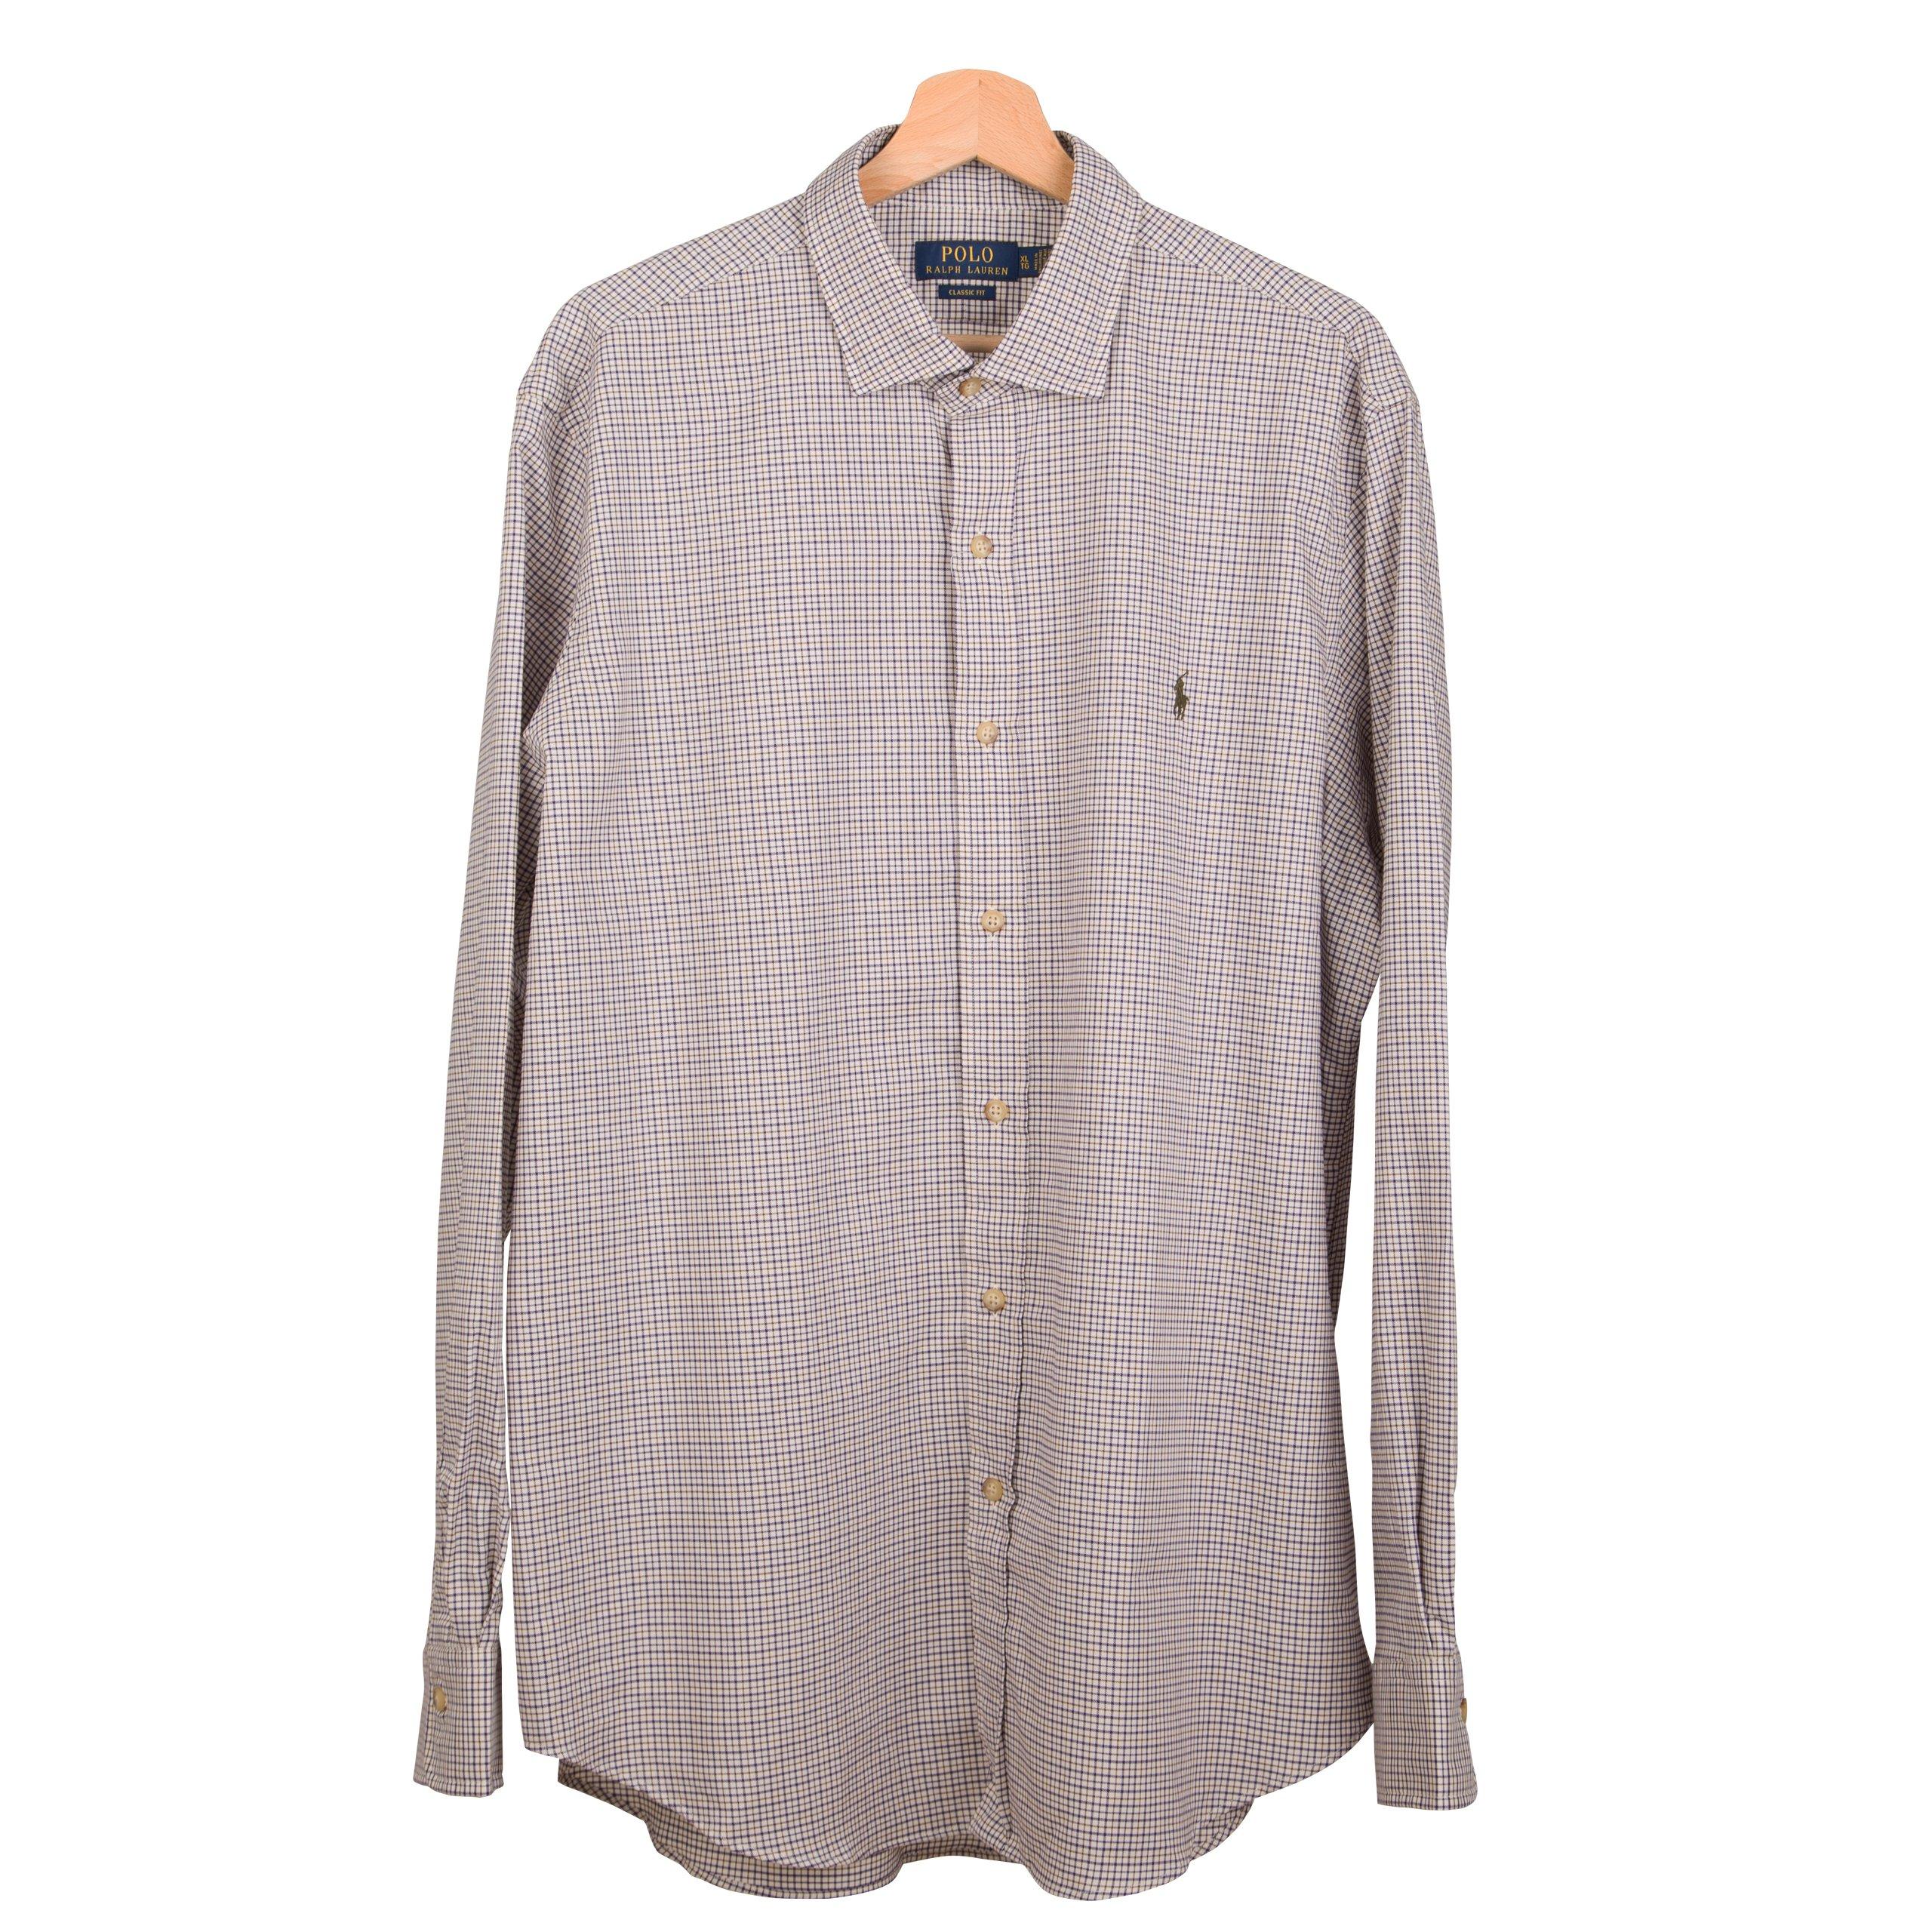 RALPH LAUREN POLO koszula męska kratka L